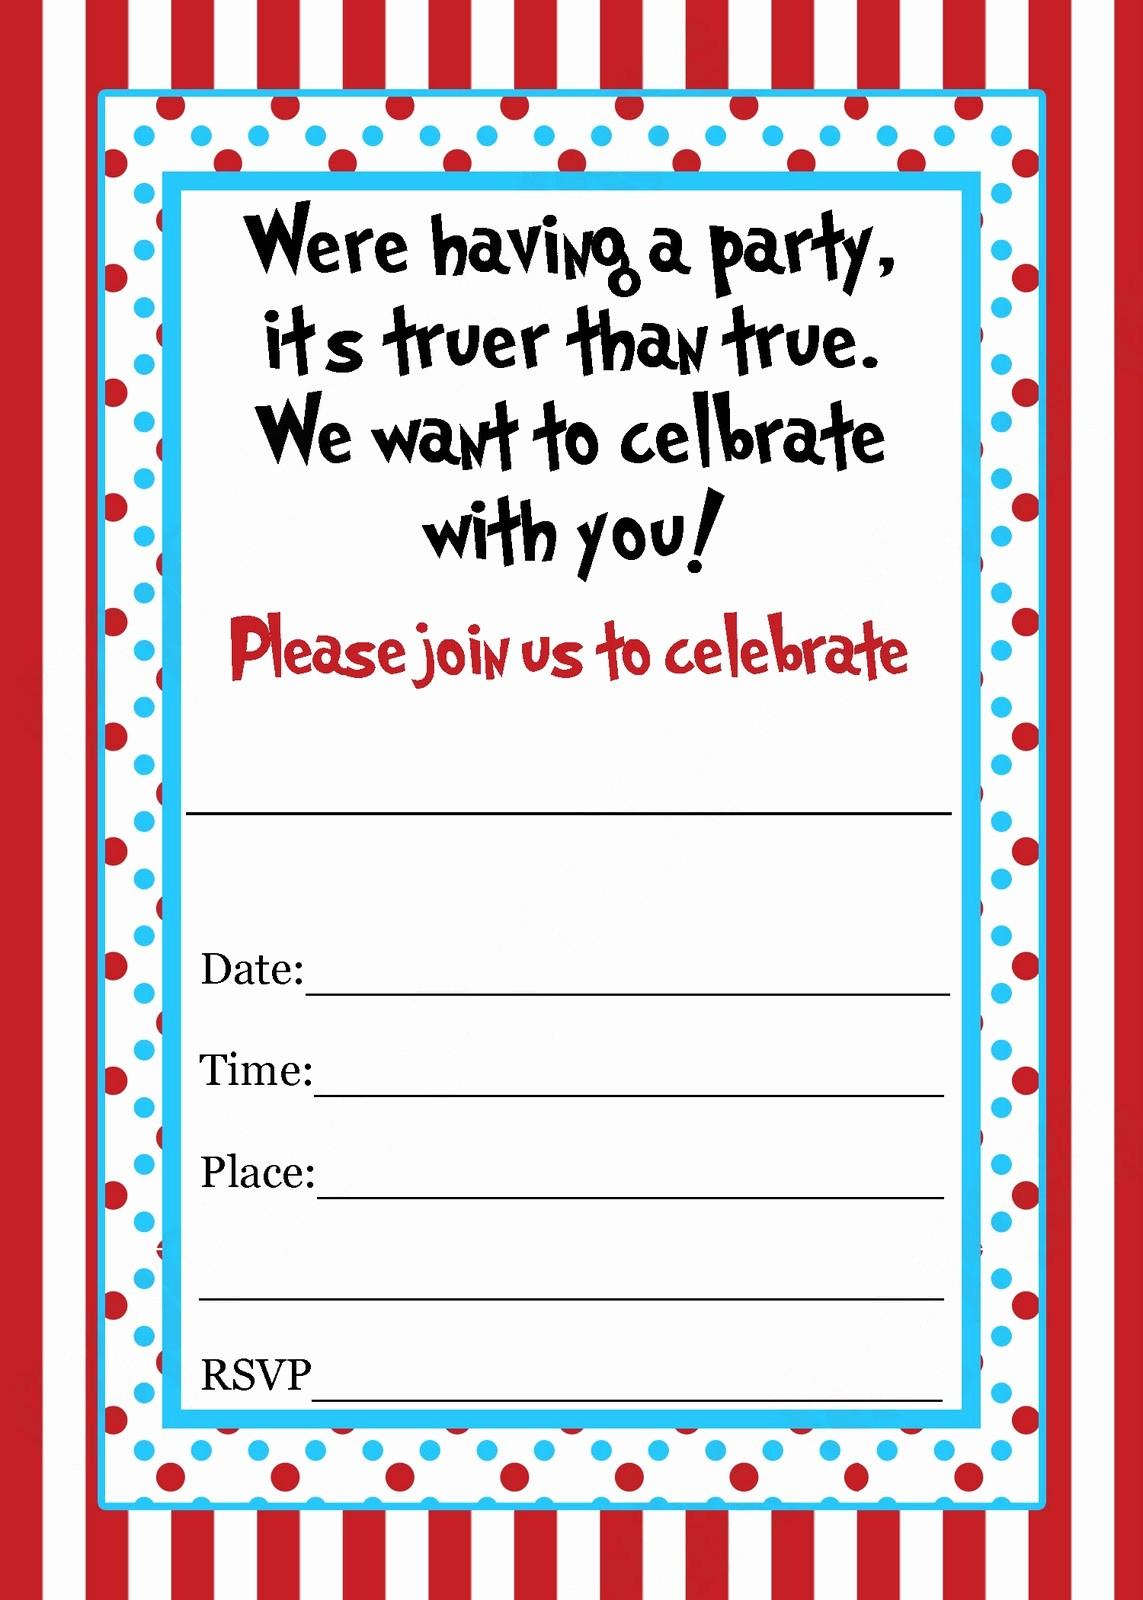 Free 40th Birthday Invitations Templates Fresh Halloween Baby Shower Invitations Halloween Baby Shower